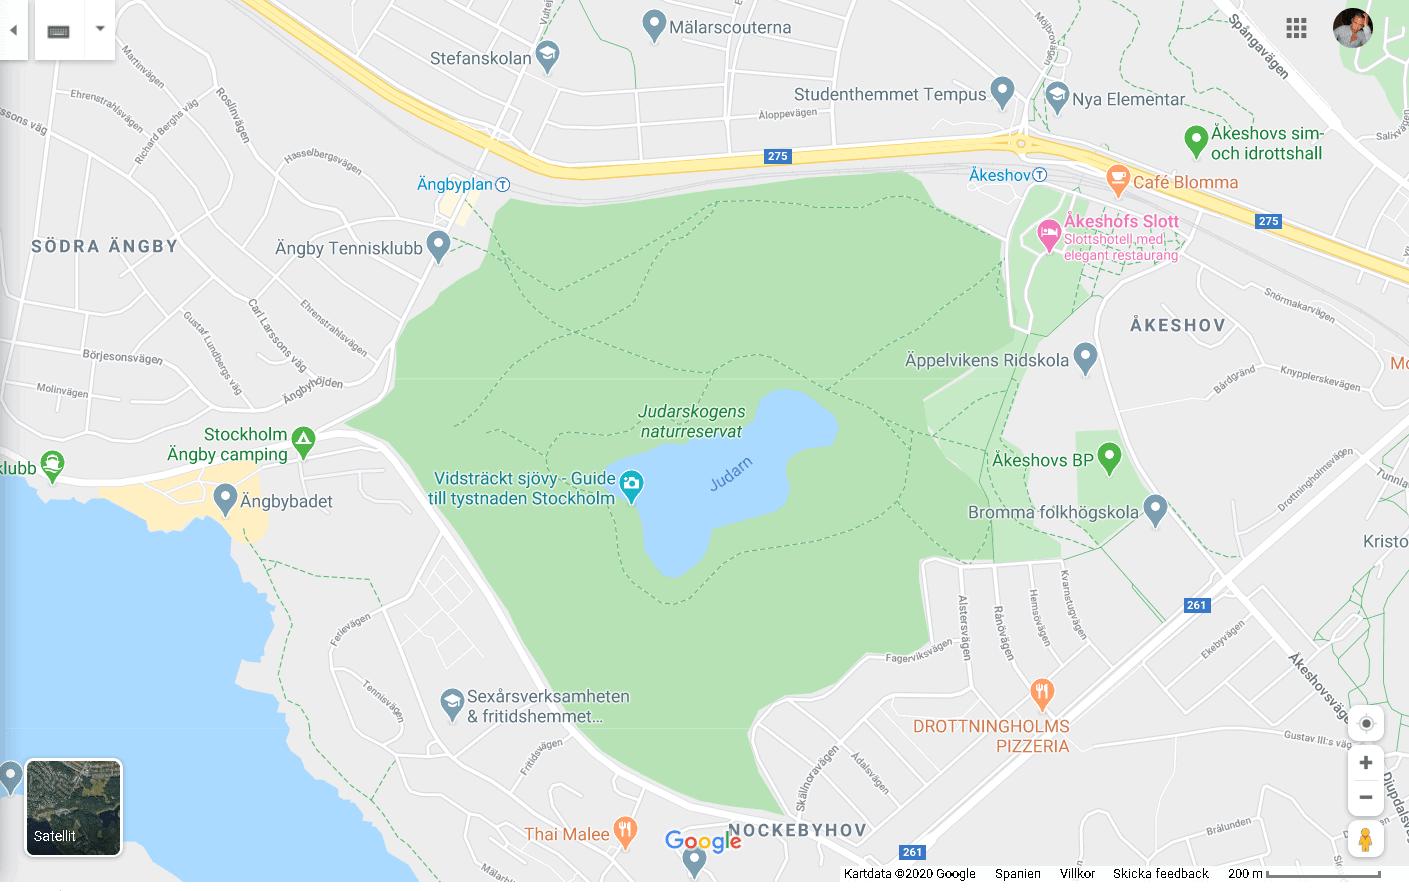 Judarskogens naturreservat karta